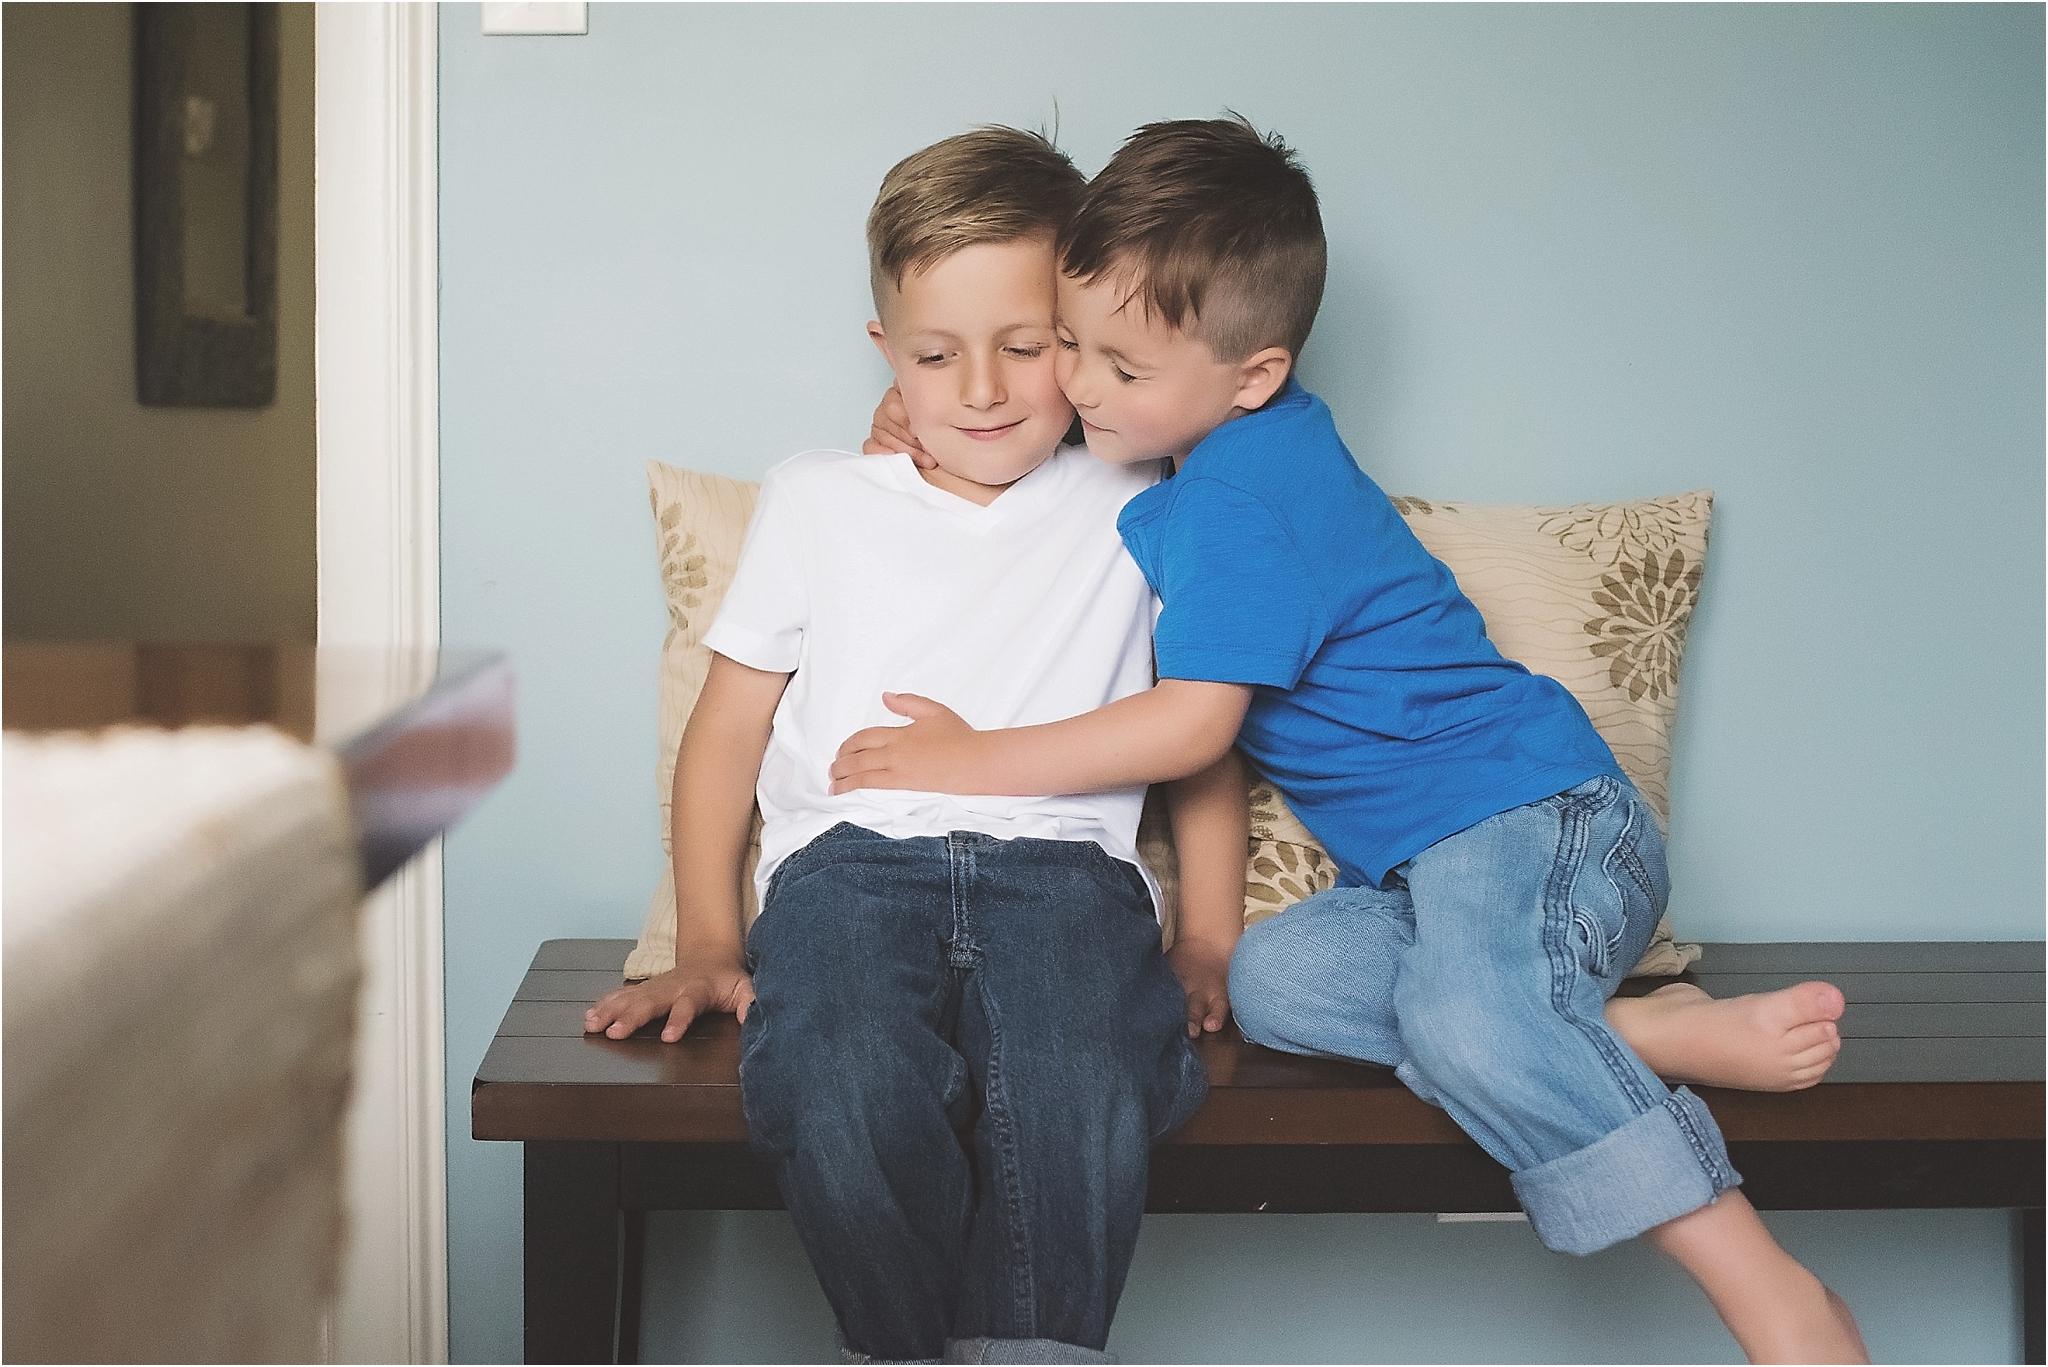 karra lynn photography - family lifestyle photographer michigan - brothers hugging